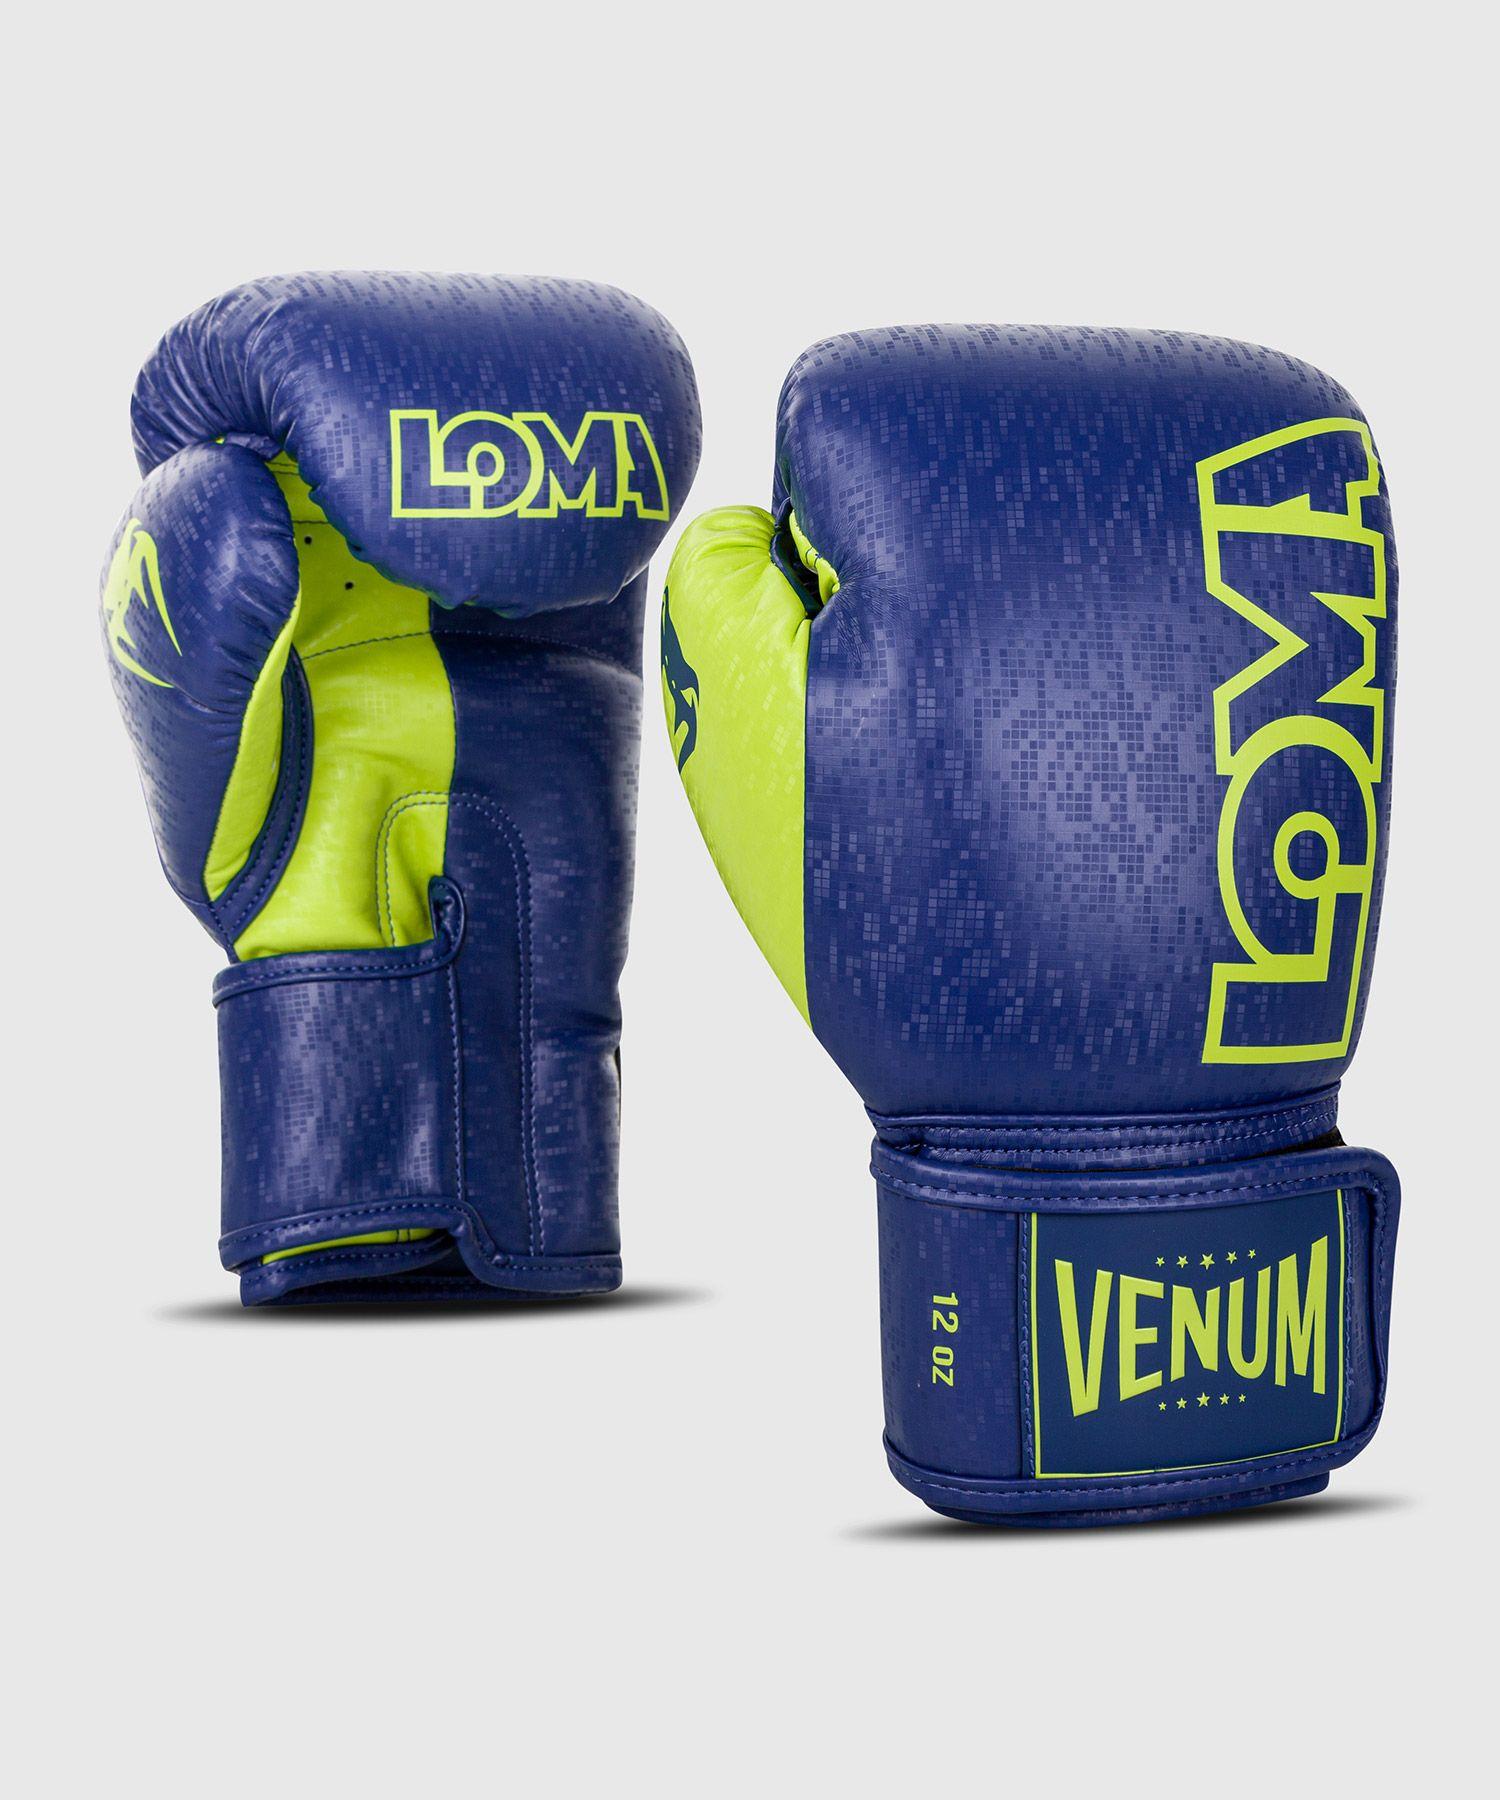 Боксерские перчатки  Venum Origins Loma Edition